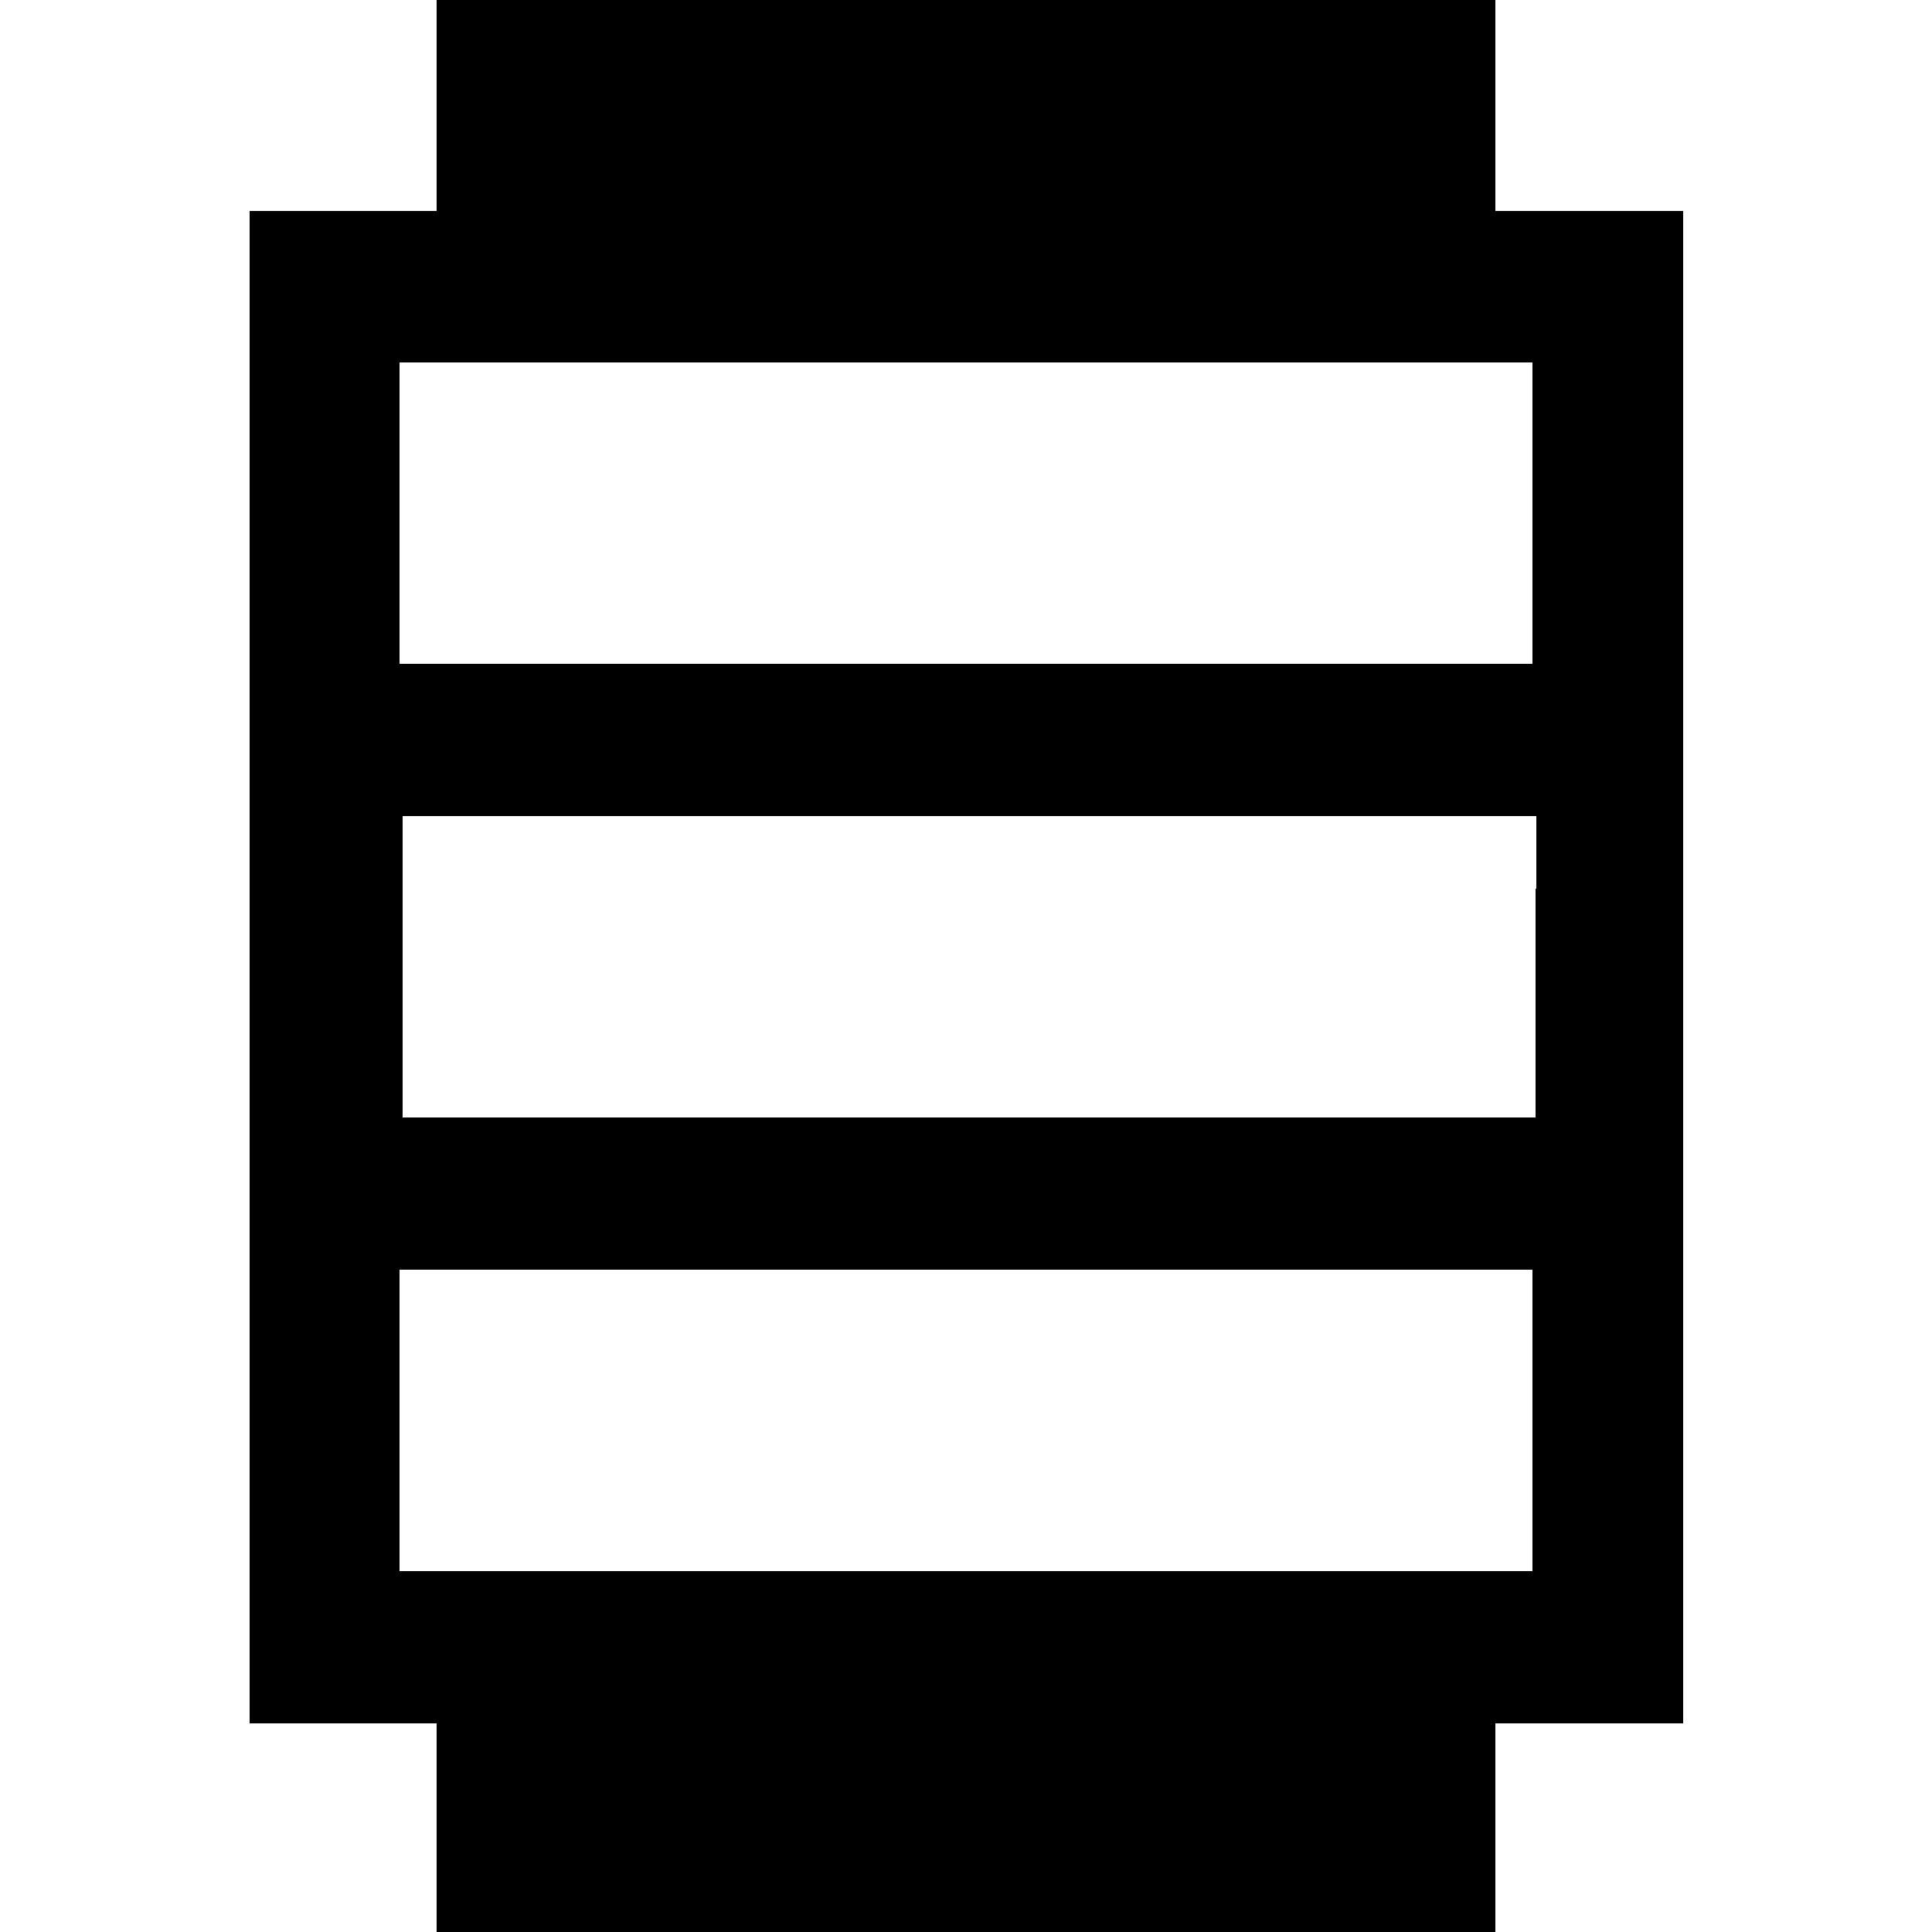 Bravedo.emblem.white.png